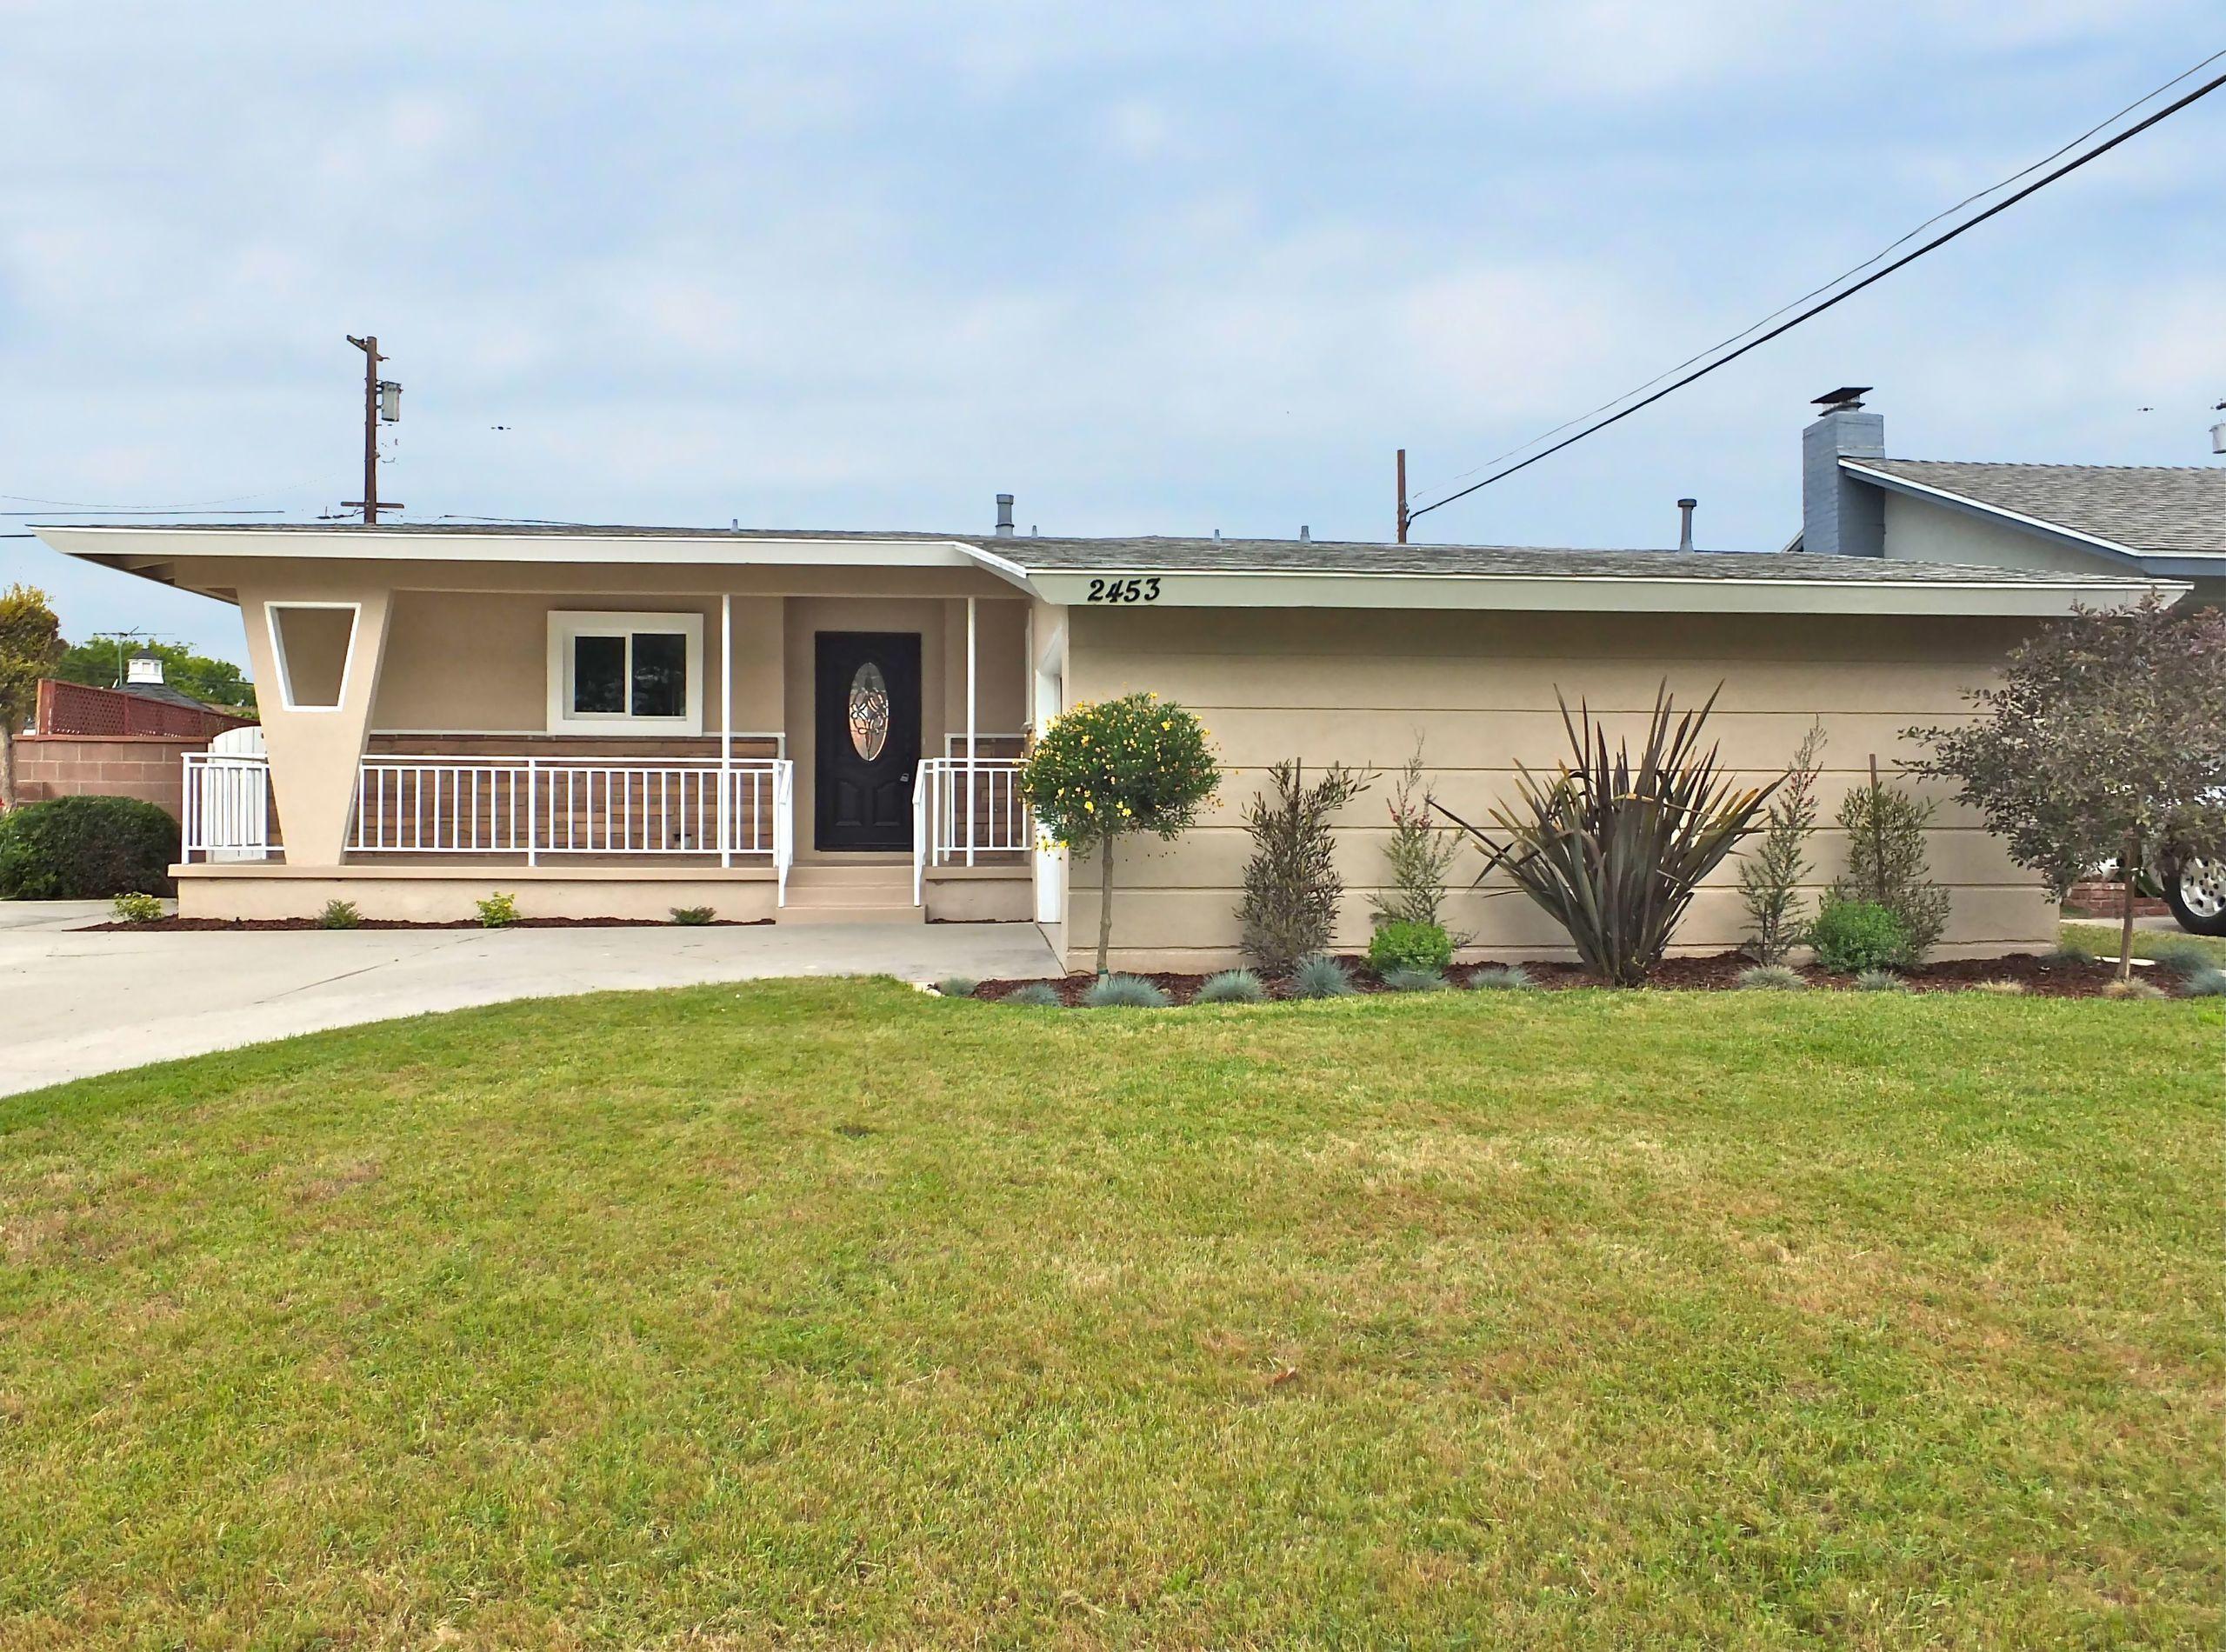 2453 Monogram Ave Long Beach, CA 90815